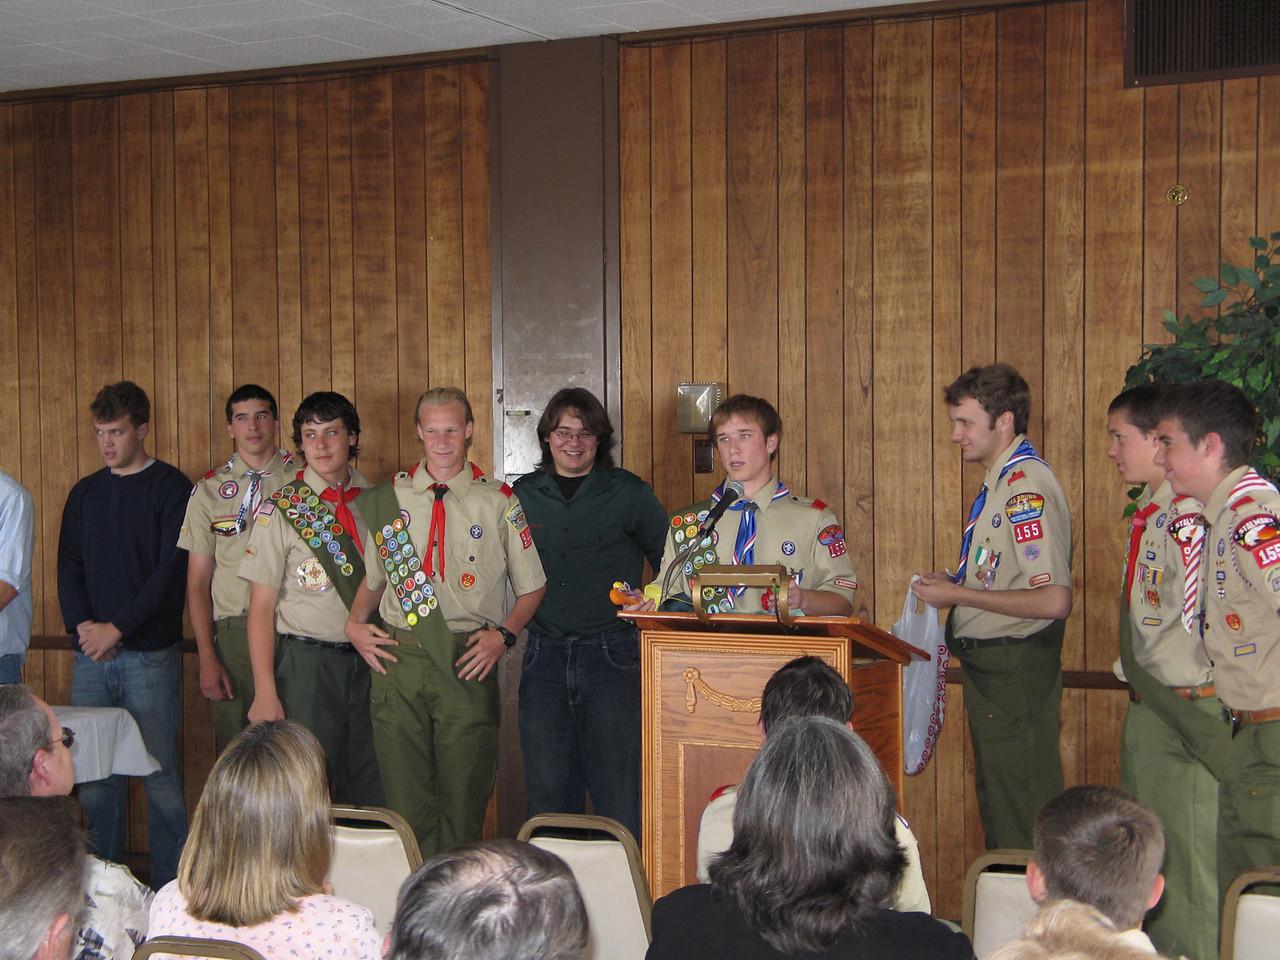 2007 - Josh Glenn's Eagle Court of Honor - Troop 155